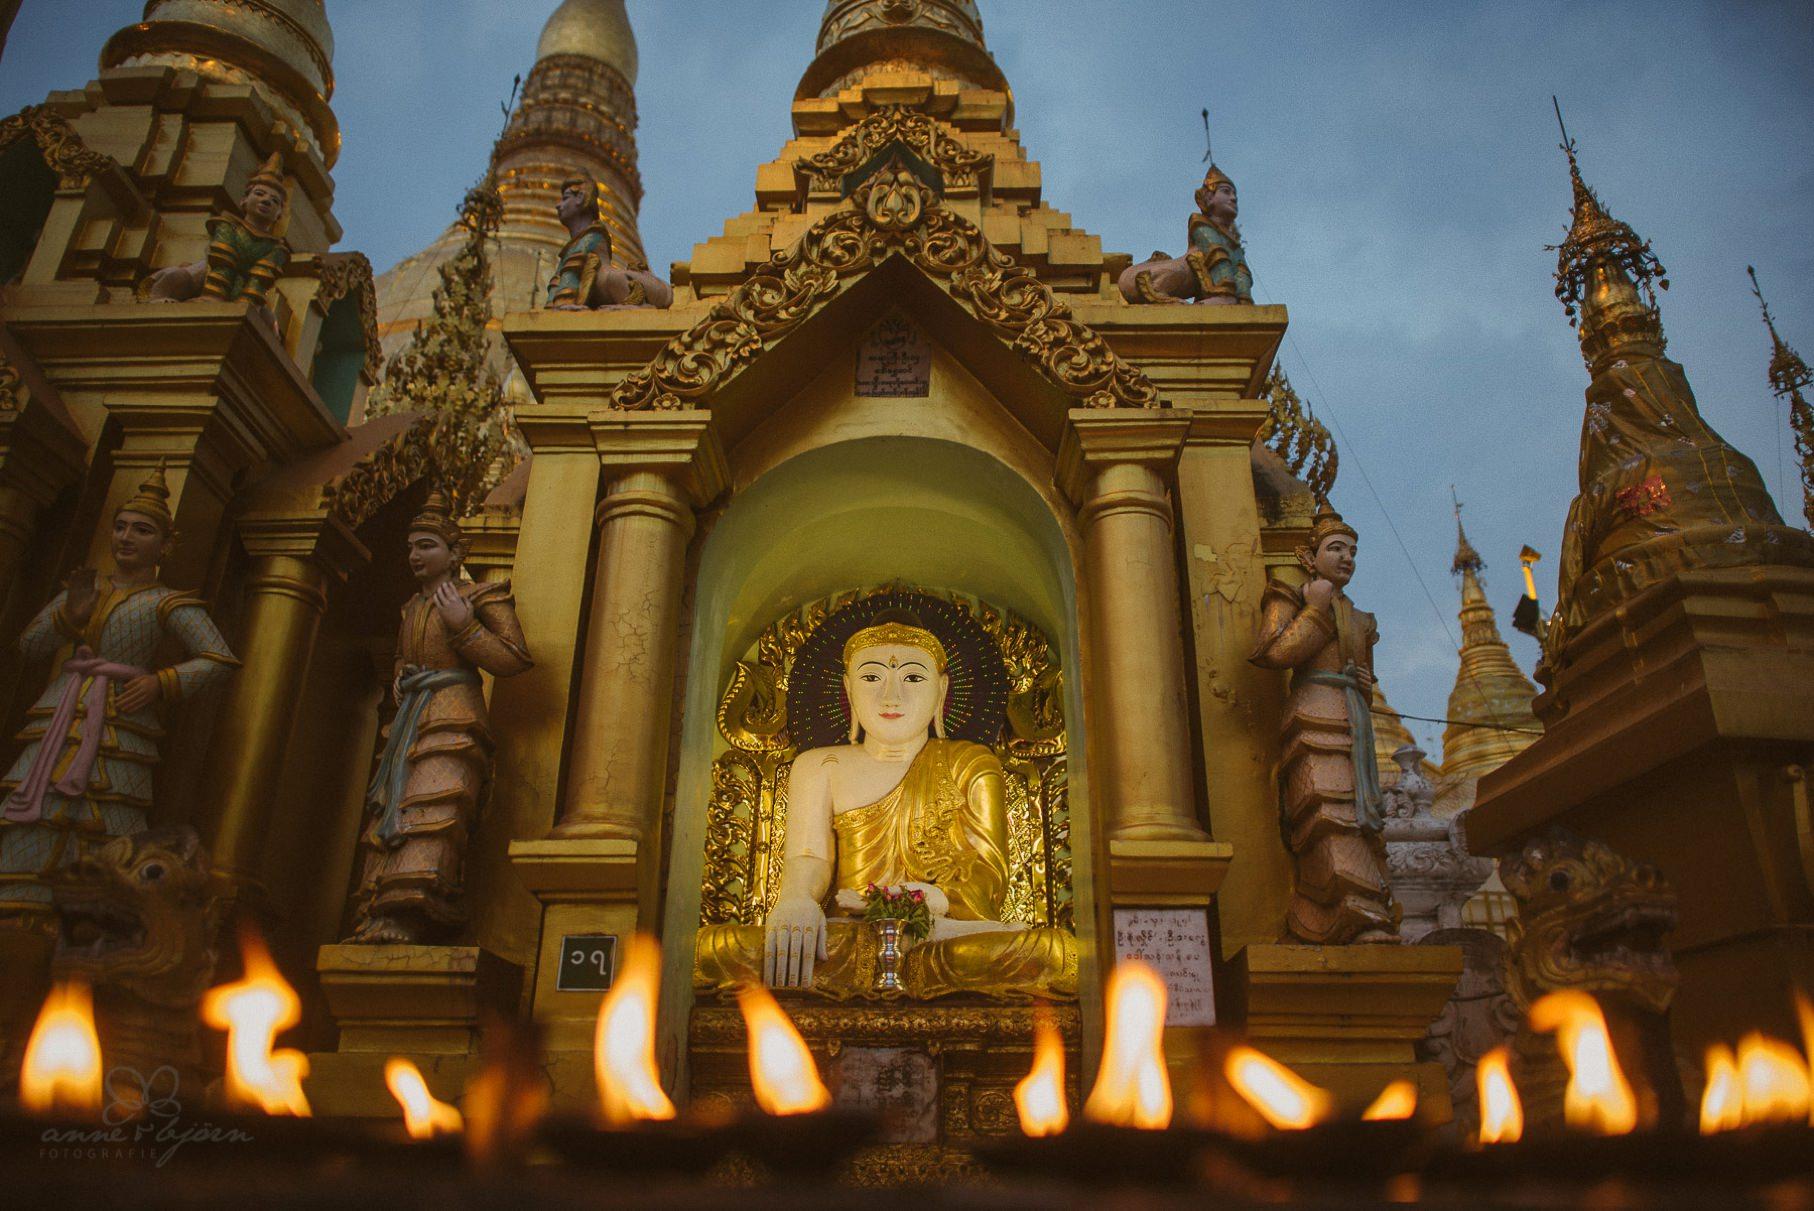 0022 yangon mandalay d76 4602 - Großstädte Myanmars - Yangon & Mandalay